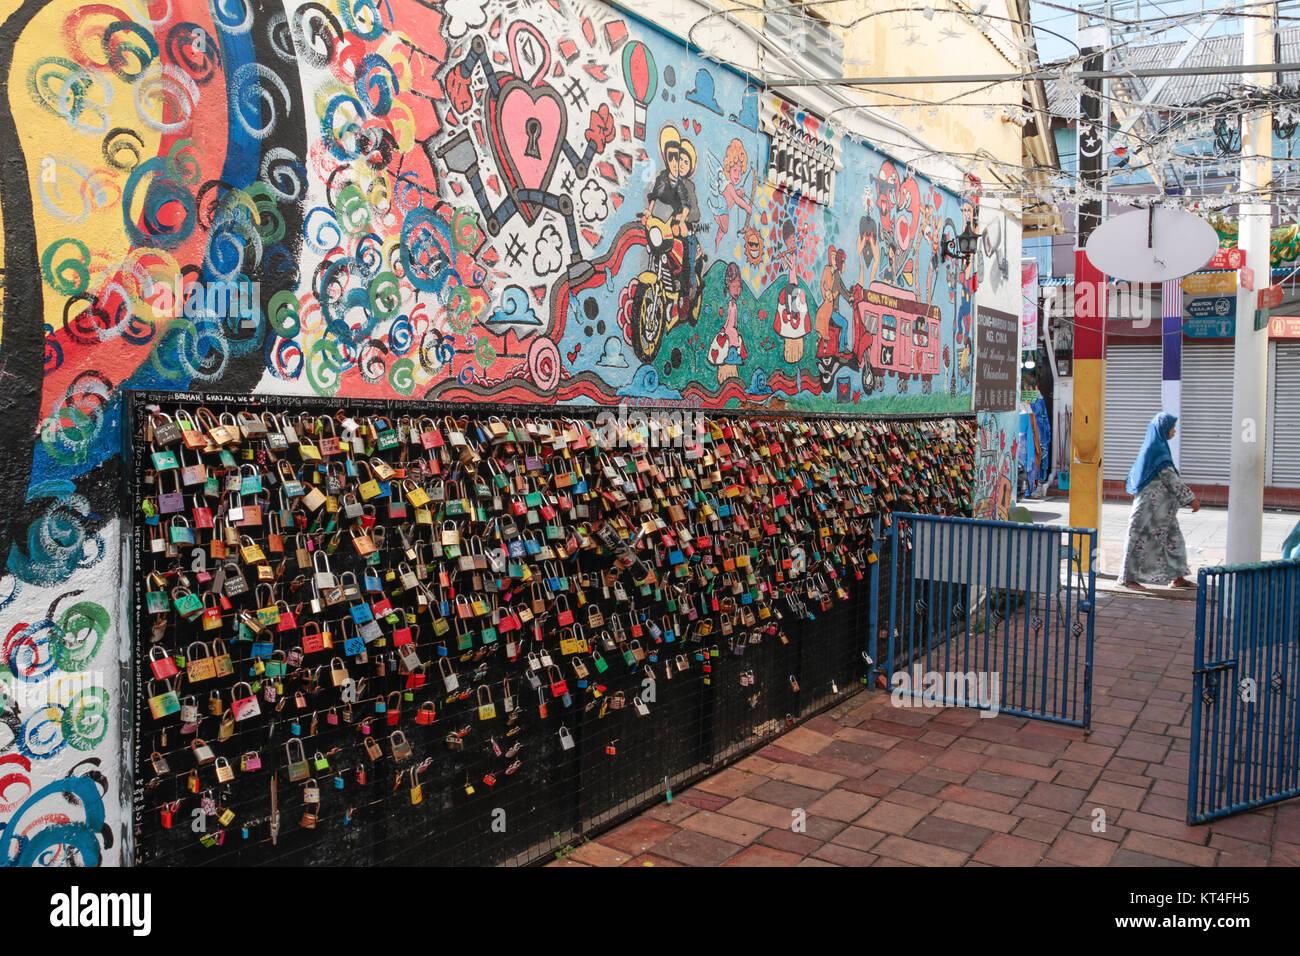 Padlocks and street art in Kuala Terengganu, Malaysia. - Stock Image